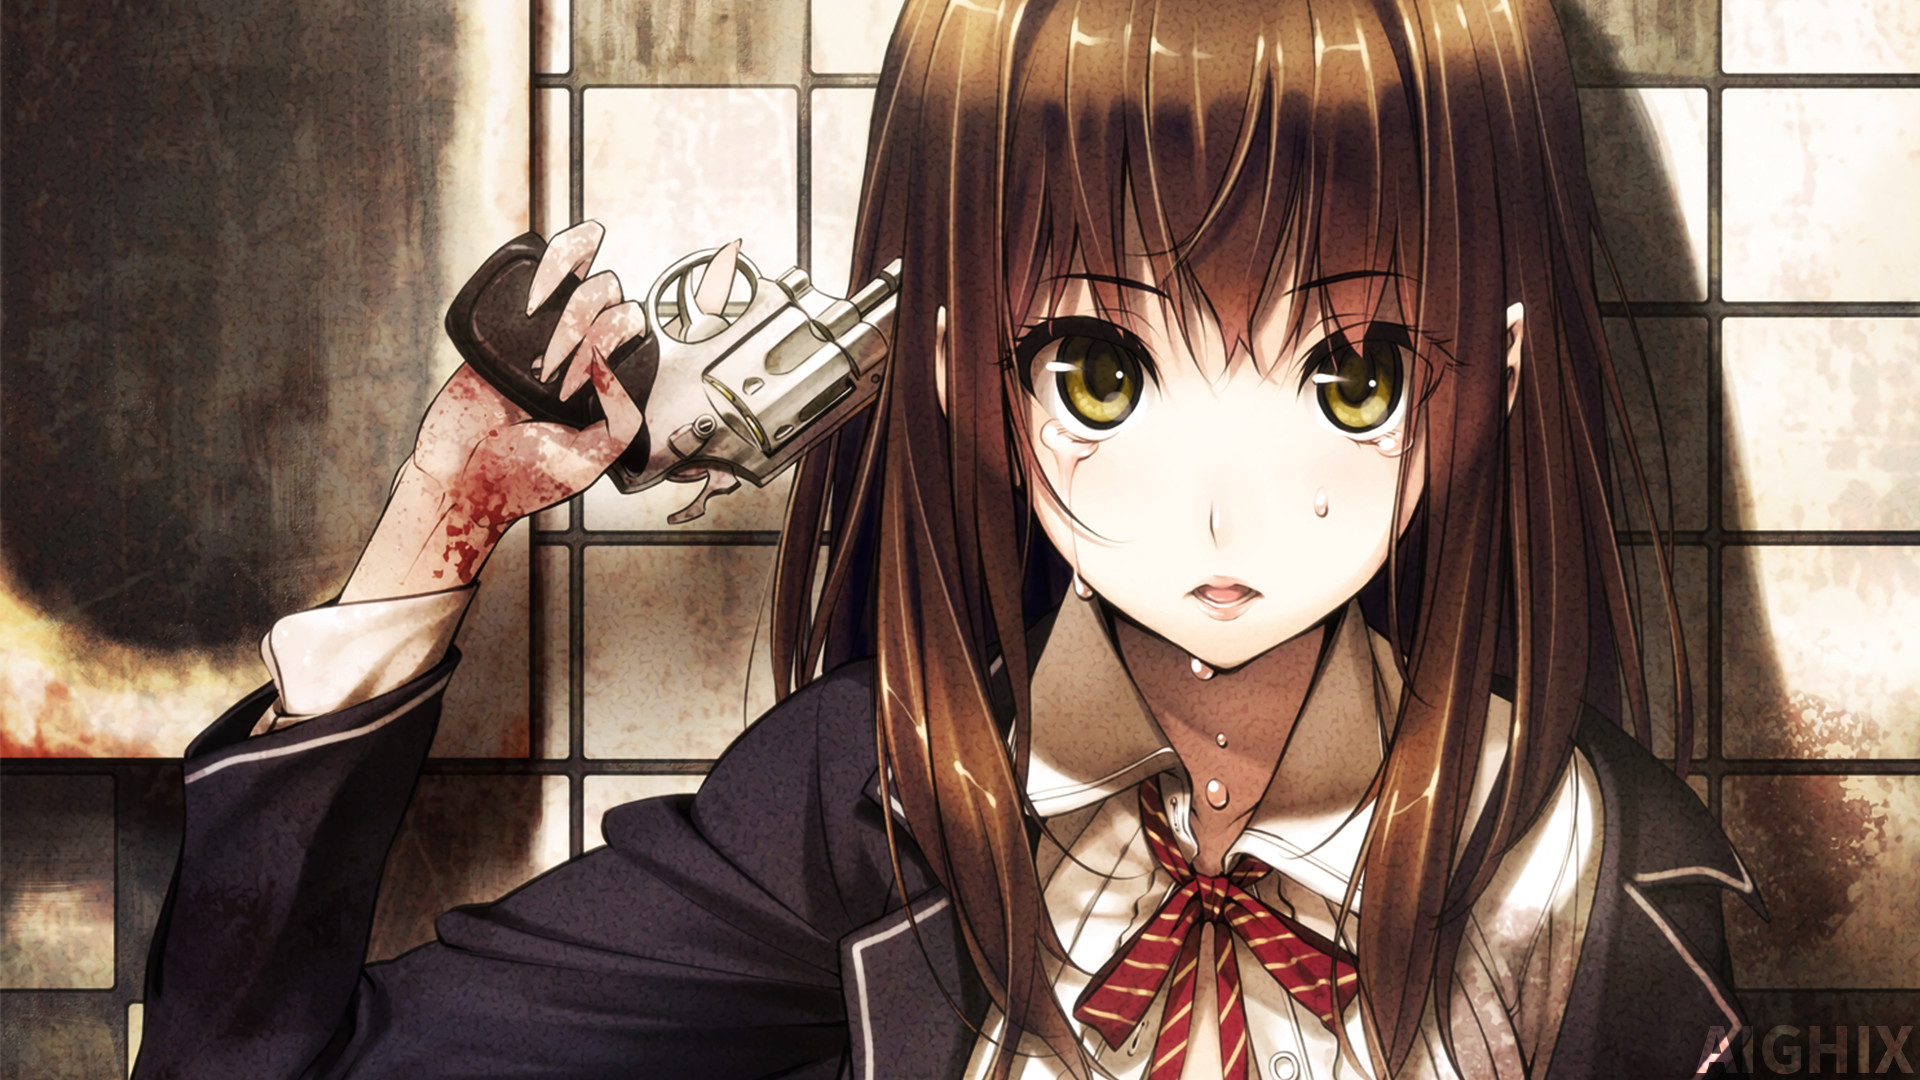 Anime Gun Wallpaper 61 Images